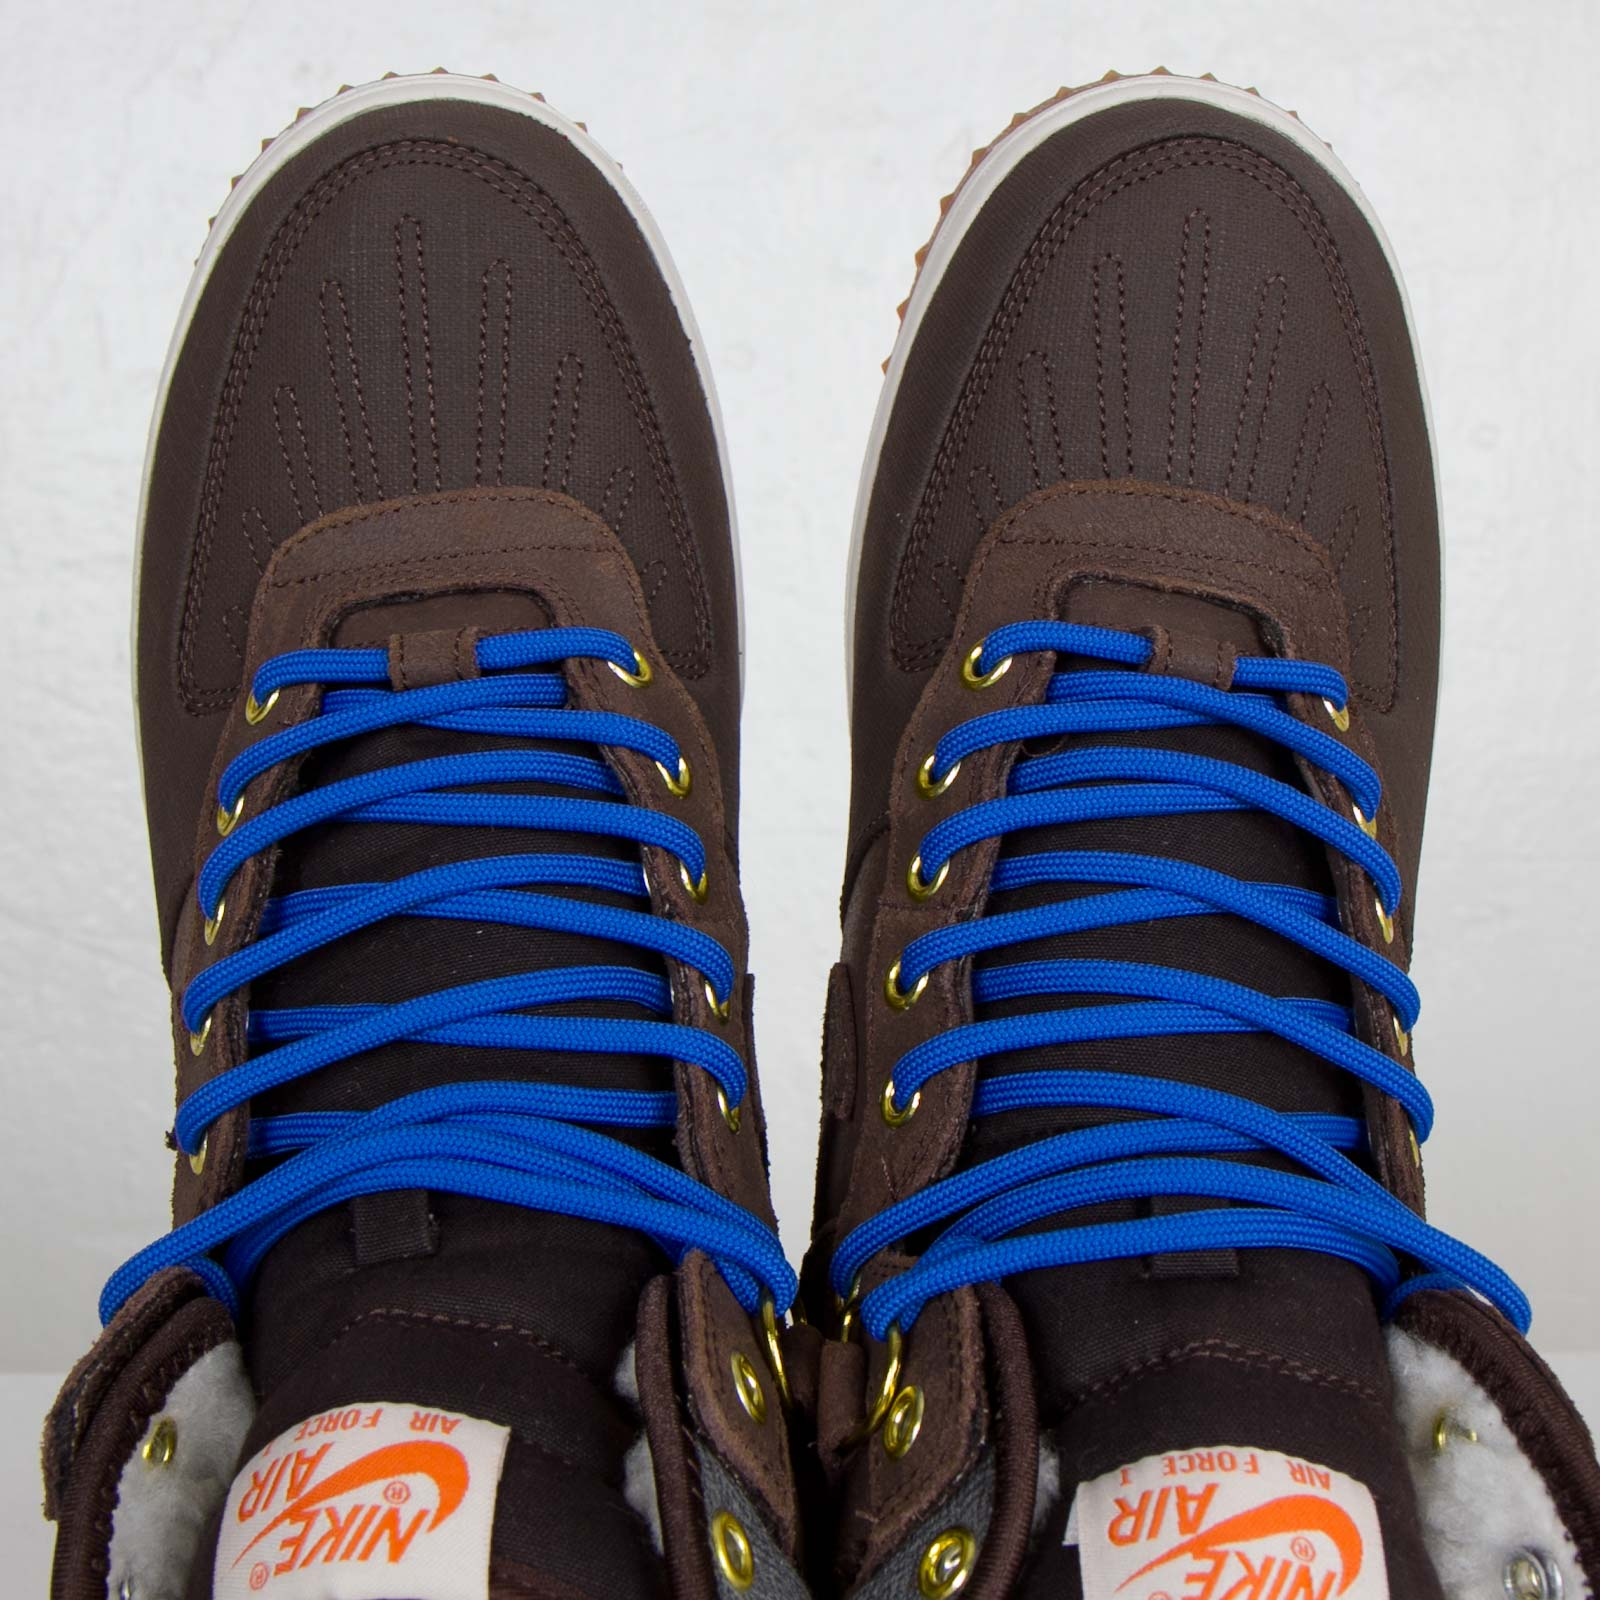 separation shoes eb65b db23f Nike Air Force 1 Duckboot - 444745-204 - Sneakersnstuff   sneakers    streetwear online since 1999